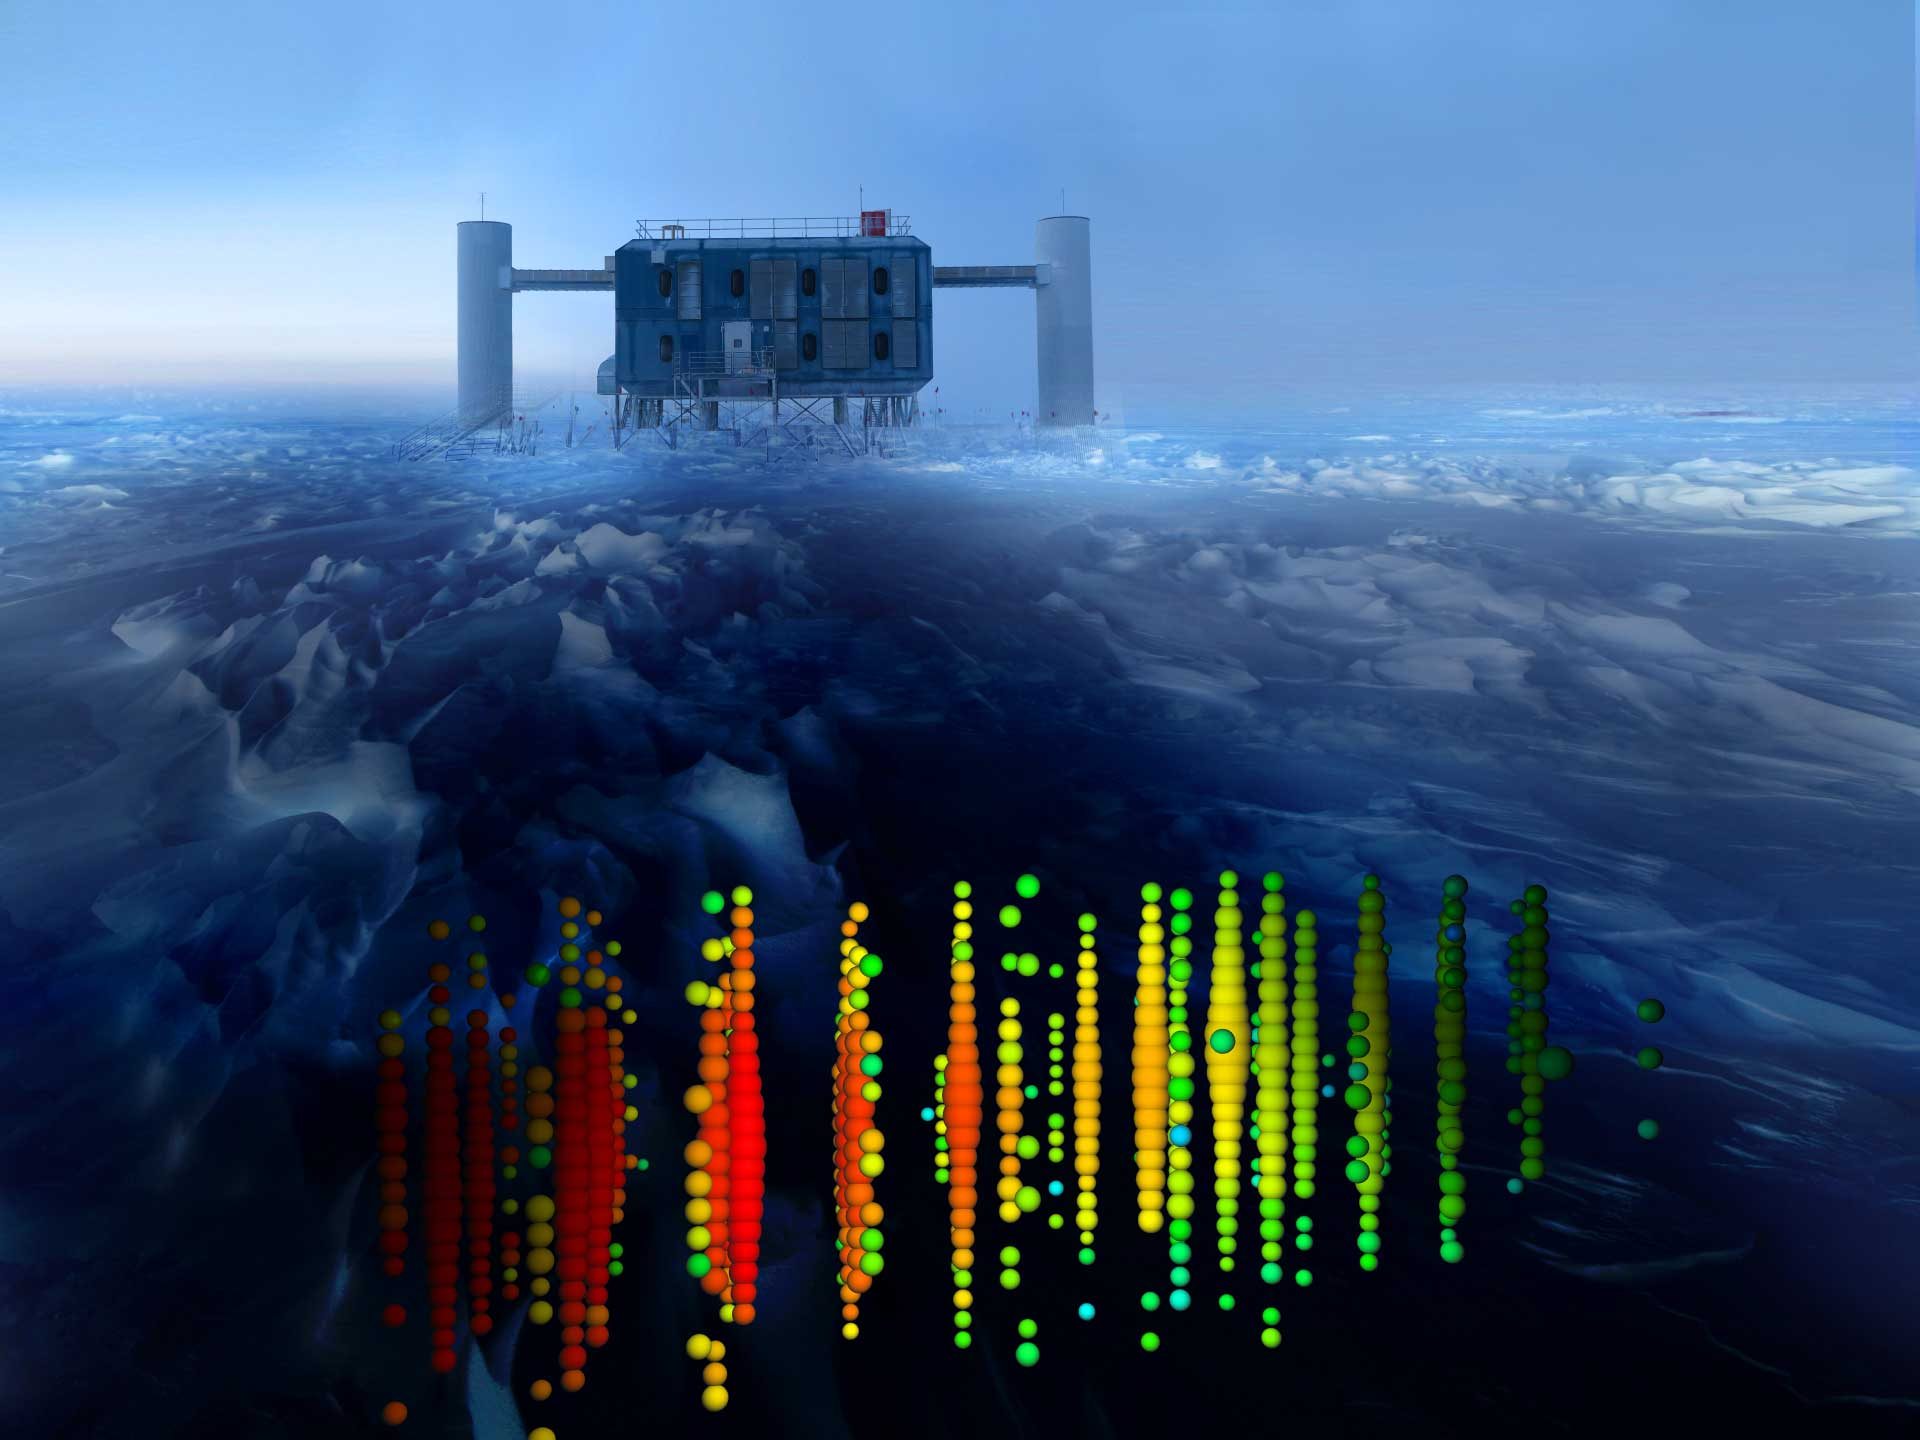 Where are the IceCube neutrinos coming from? | astrobitesIcecube Neutrino